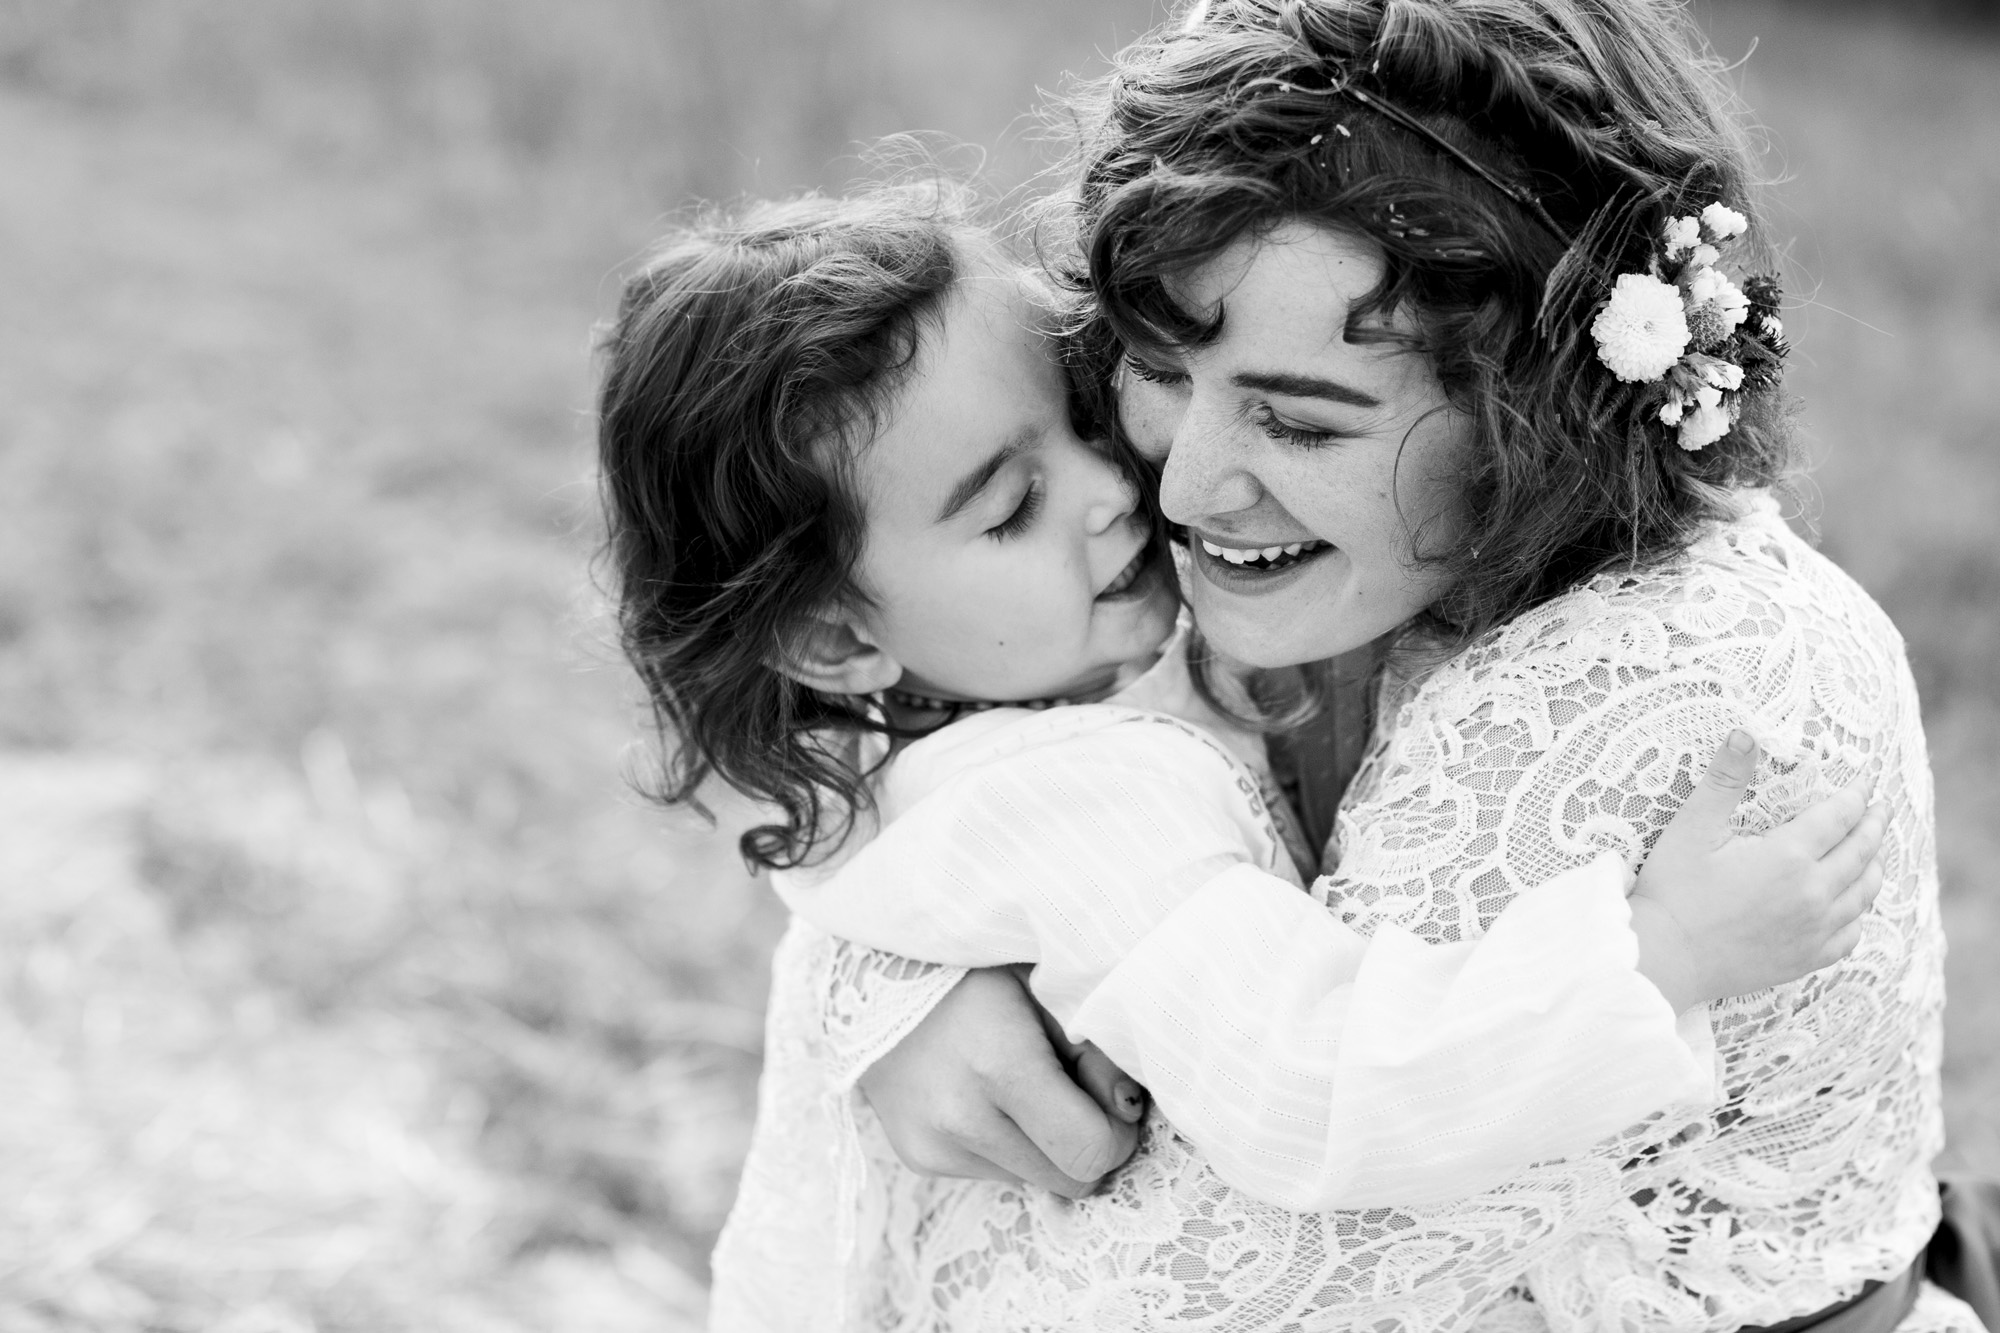 Seriously_Sabrina_Photography_Red_River_Gorge_Kentucky_Wedding_ShawnDana145.jpg